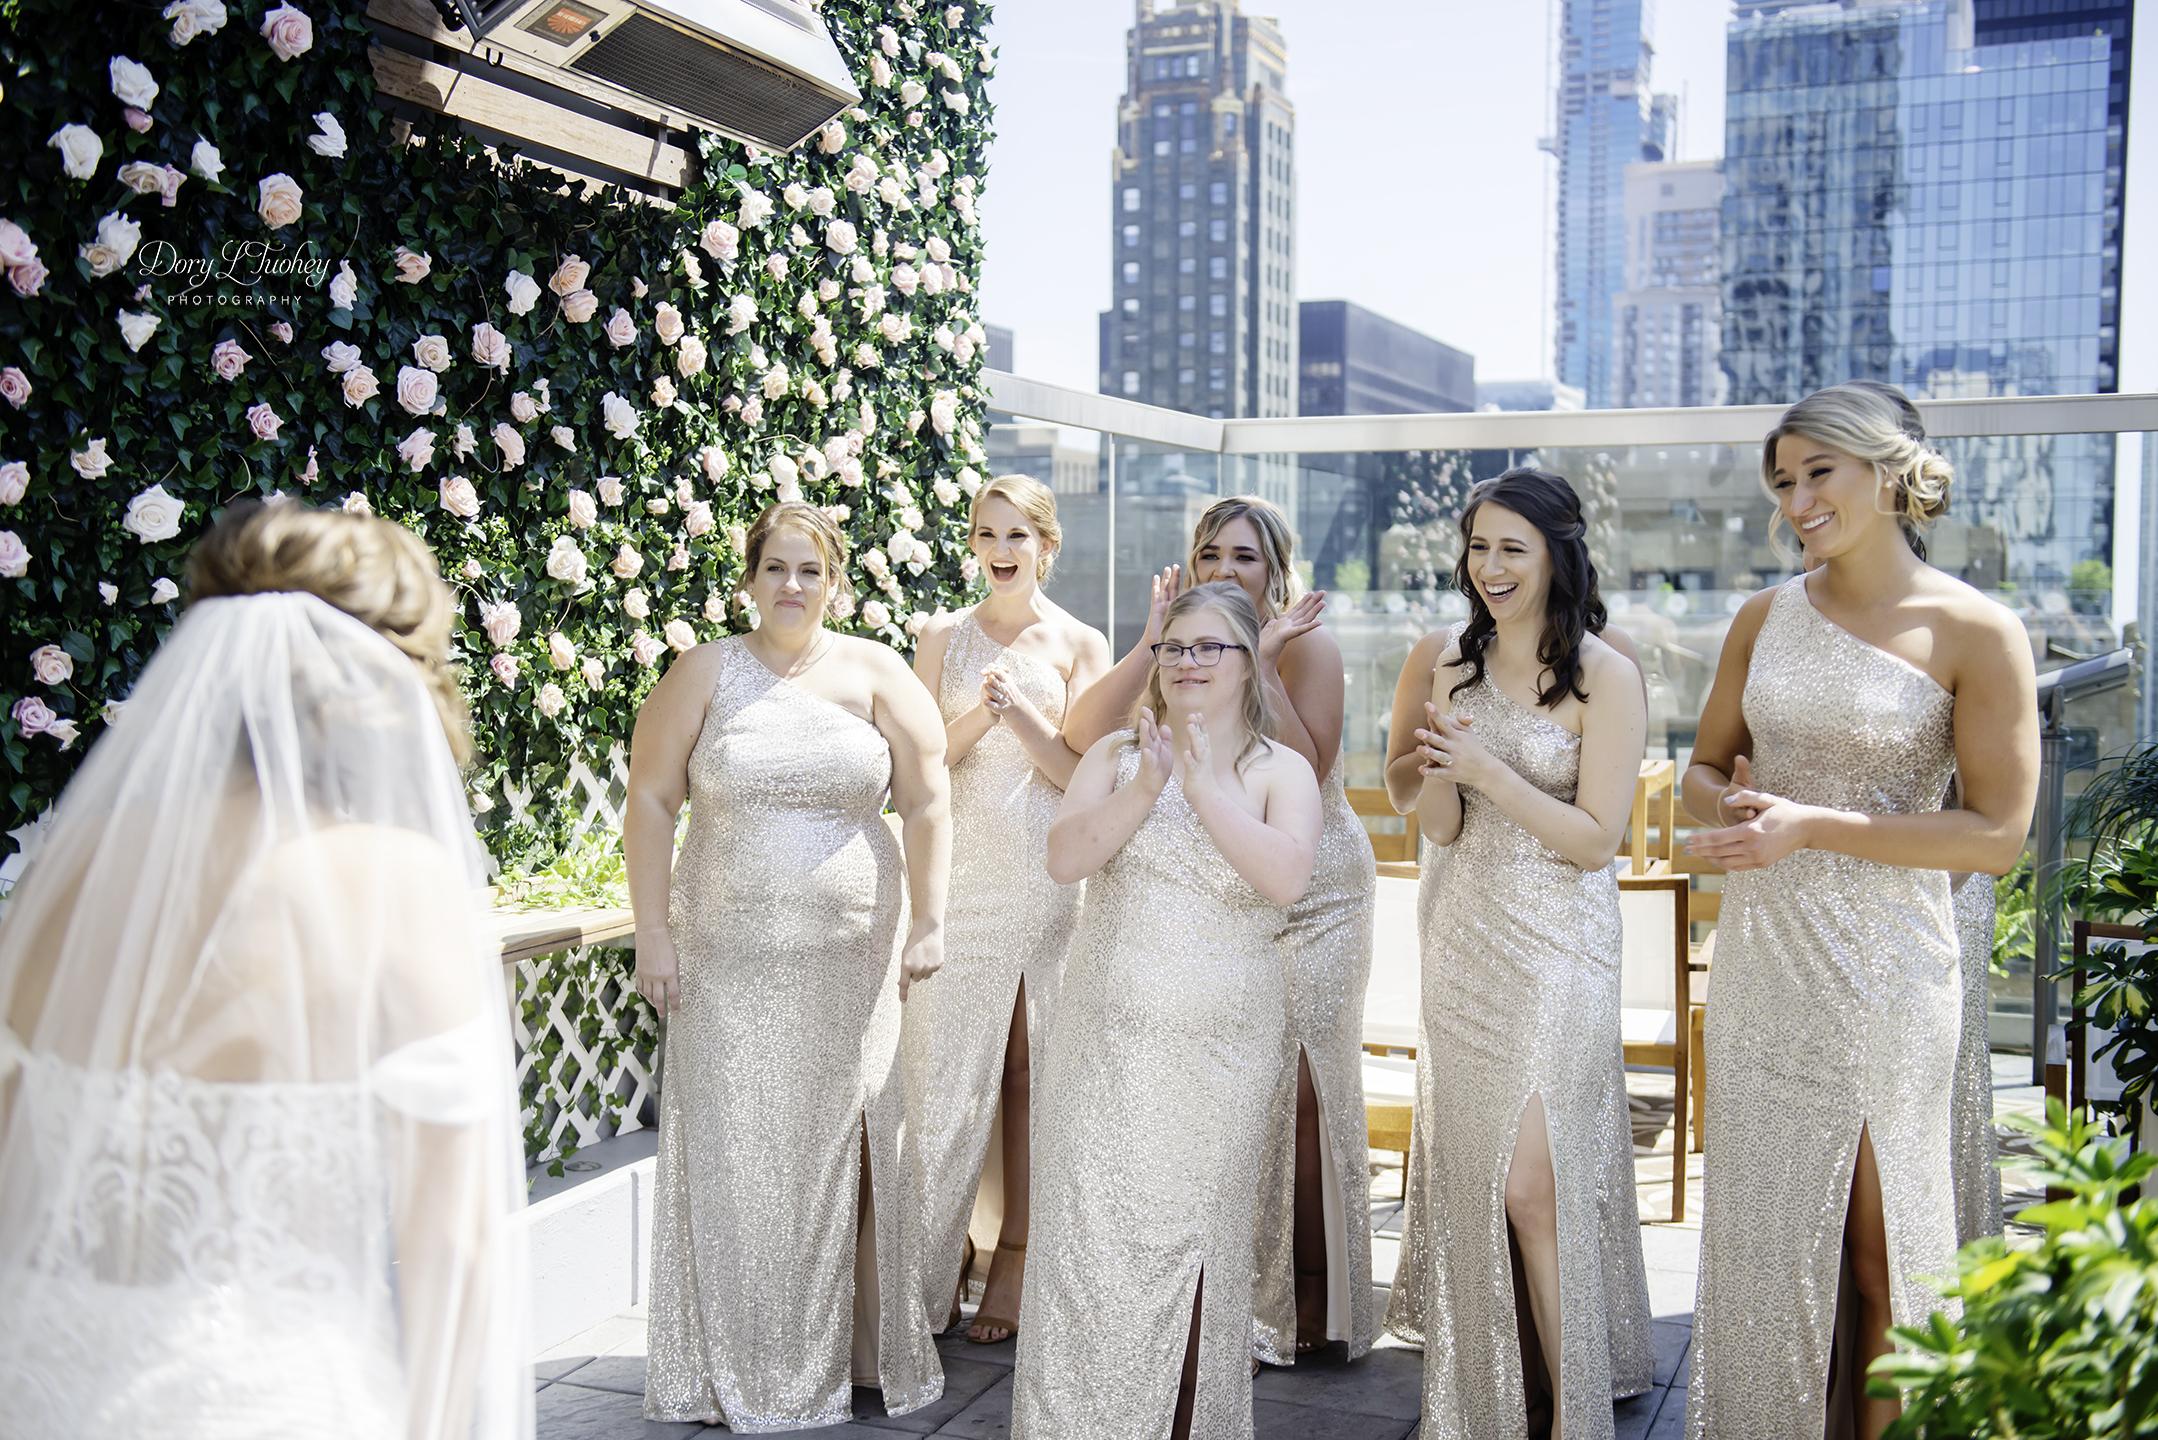 Wedding_chicago_bride_groom_photographer_wisconsin_gren_bay_wit_loyola_10.jpg